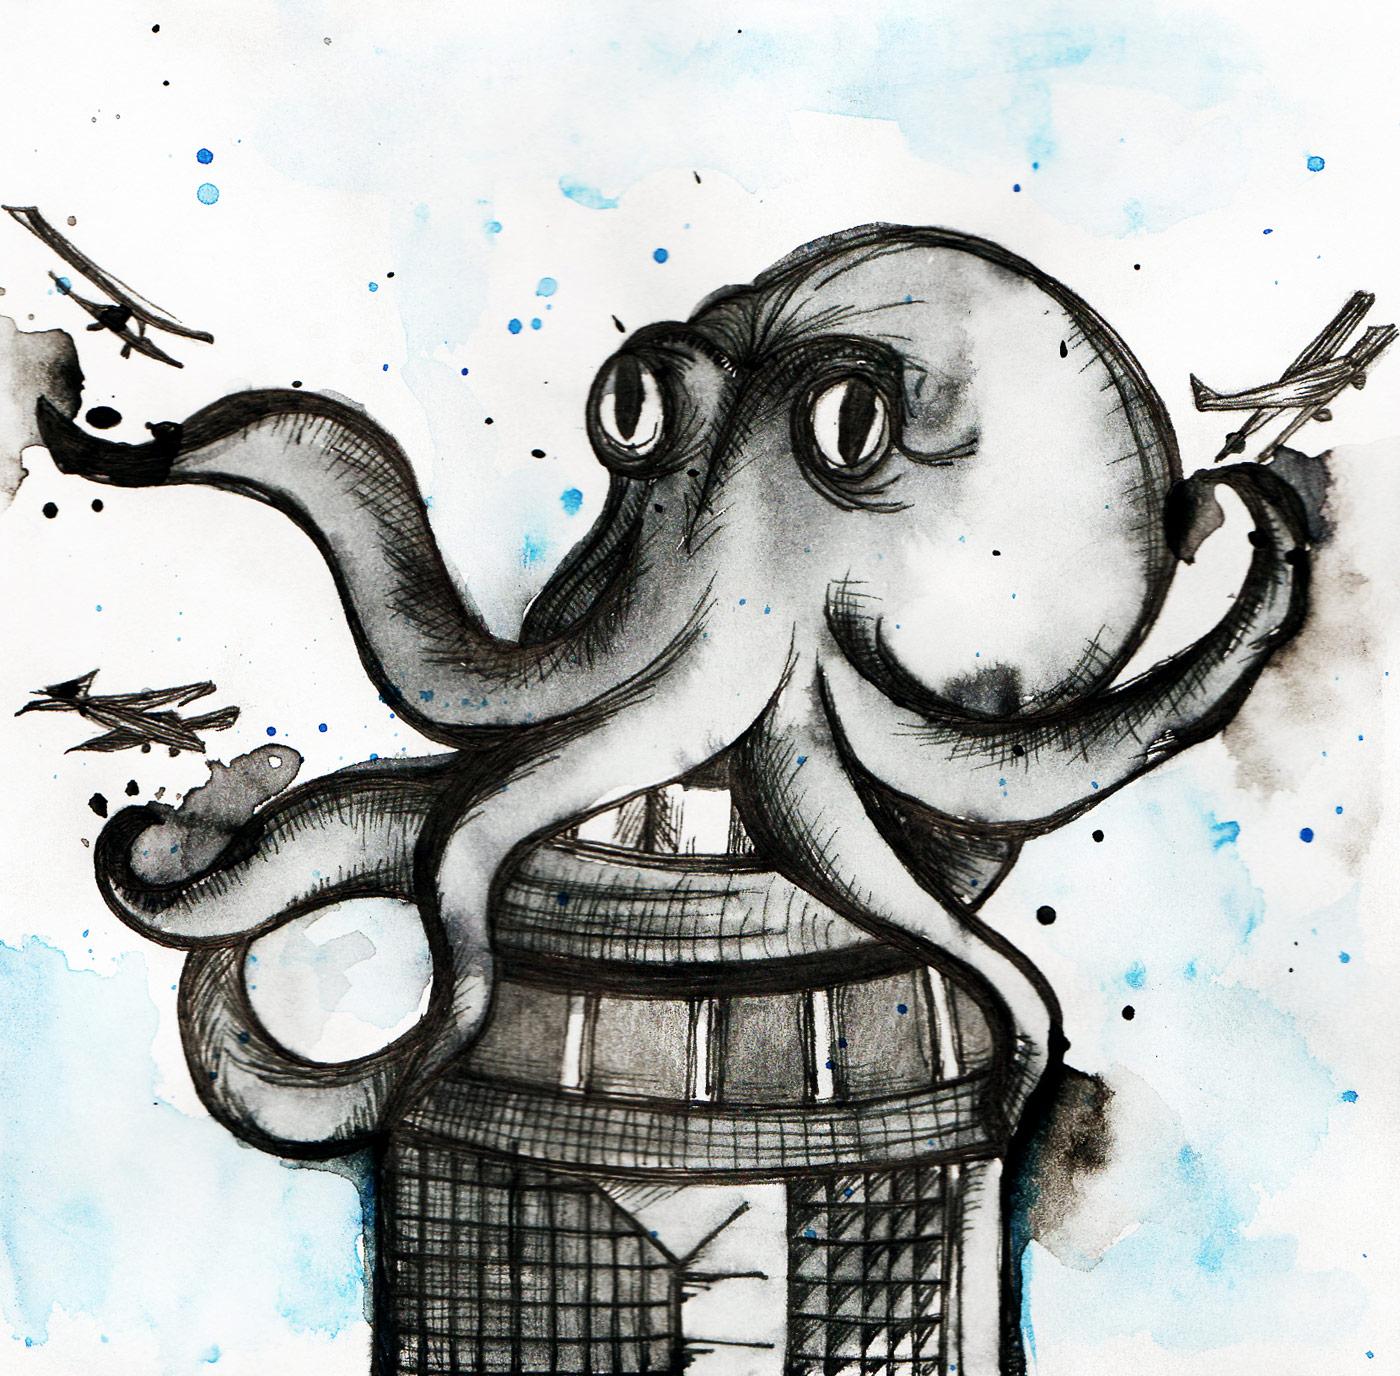 octopus-6